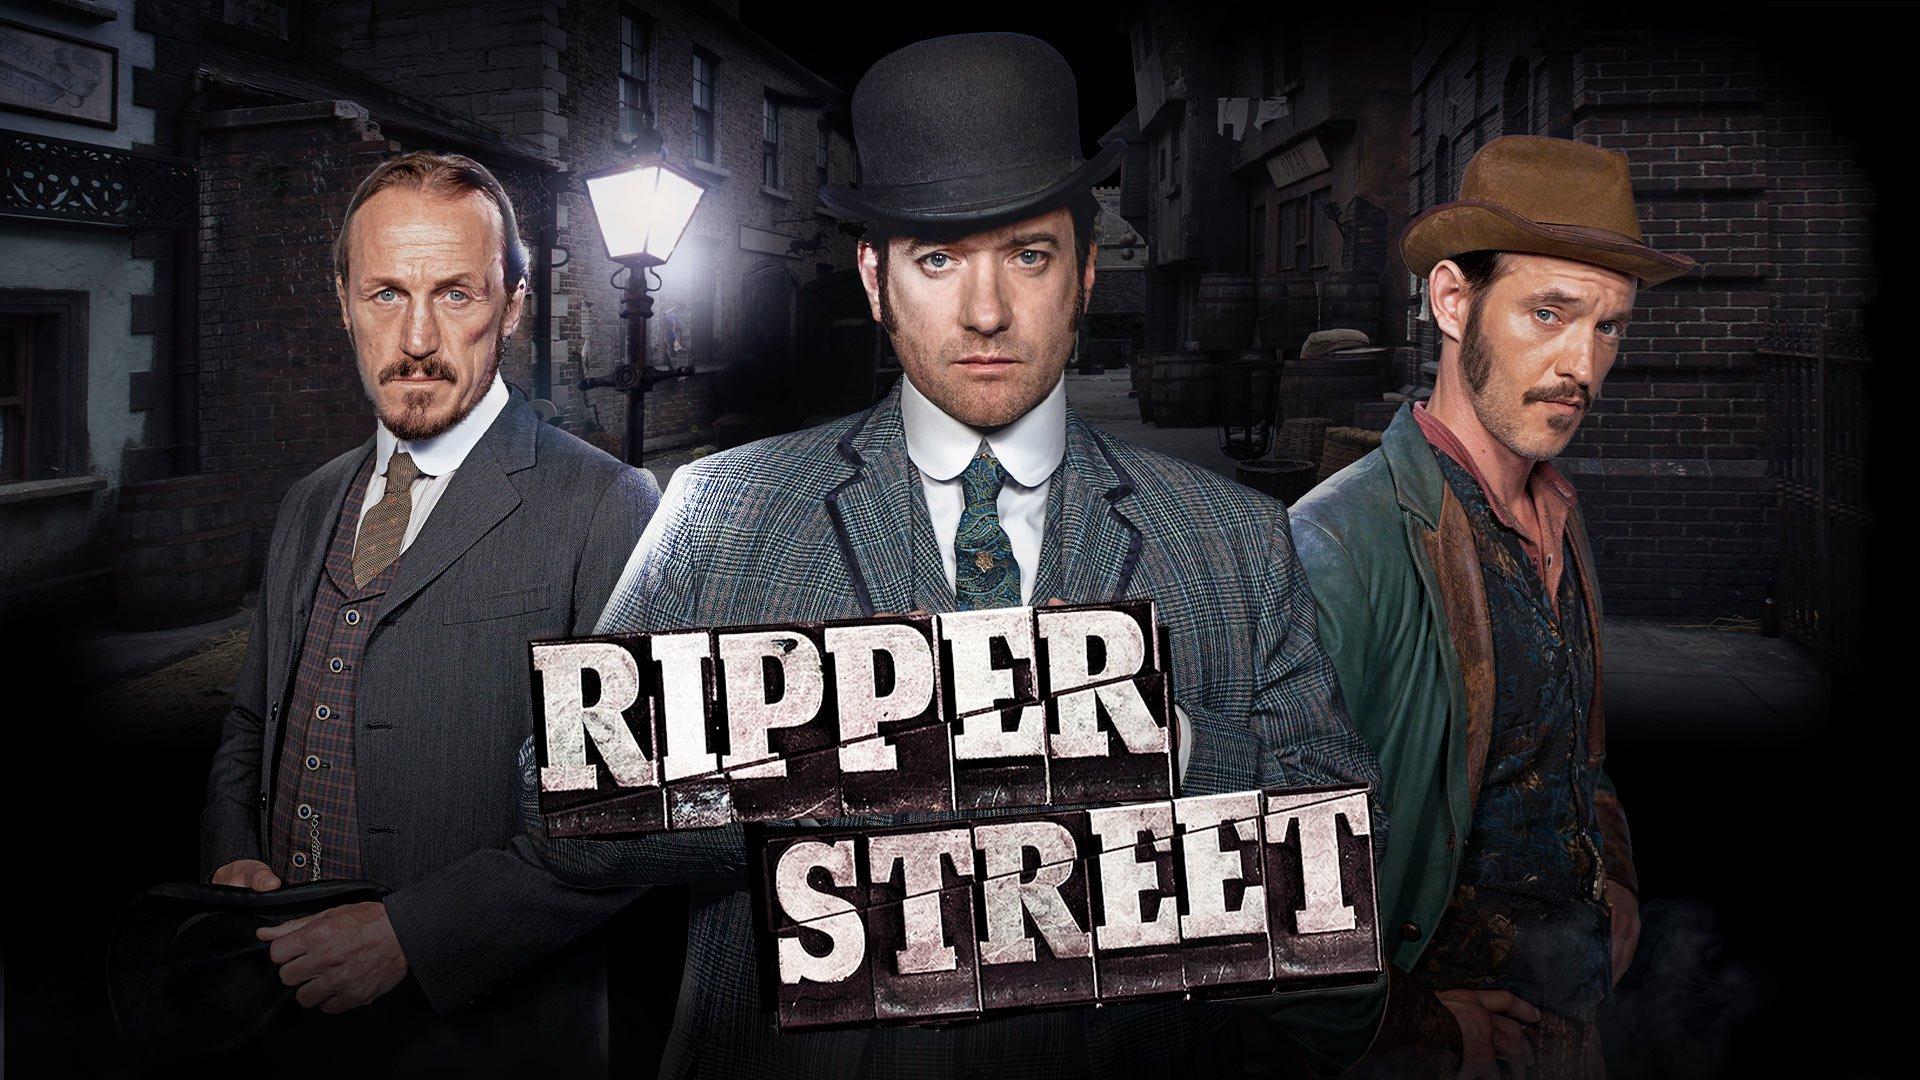 Ripper Street on BritBox UK